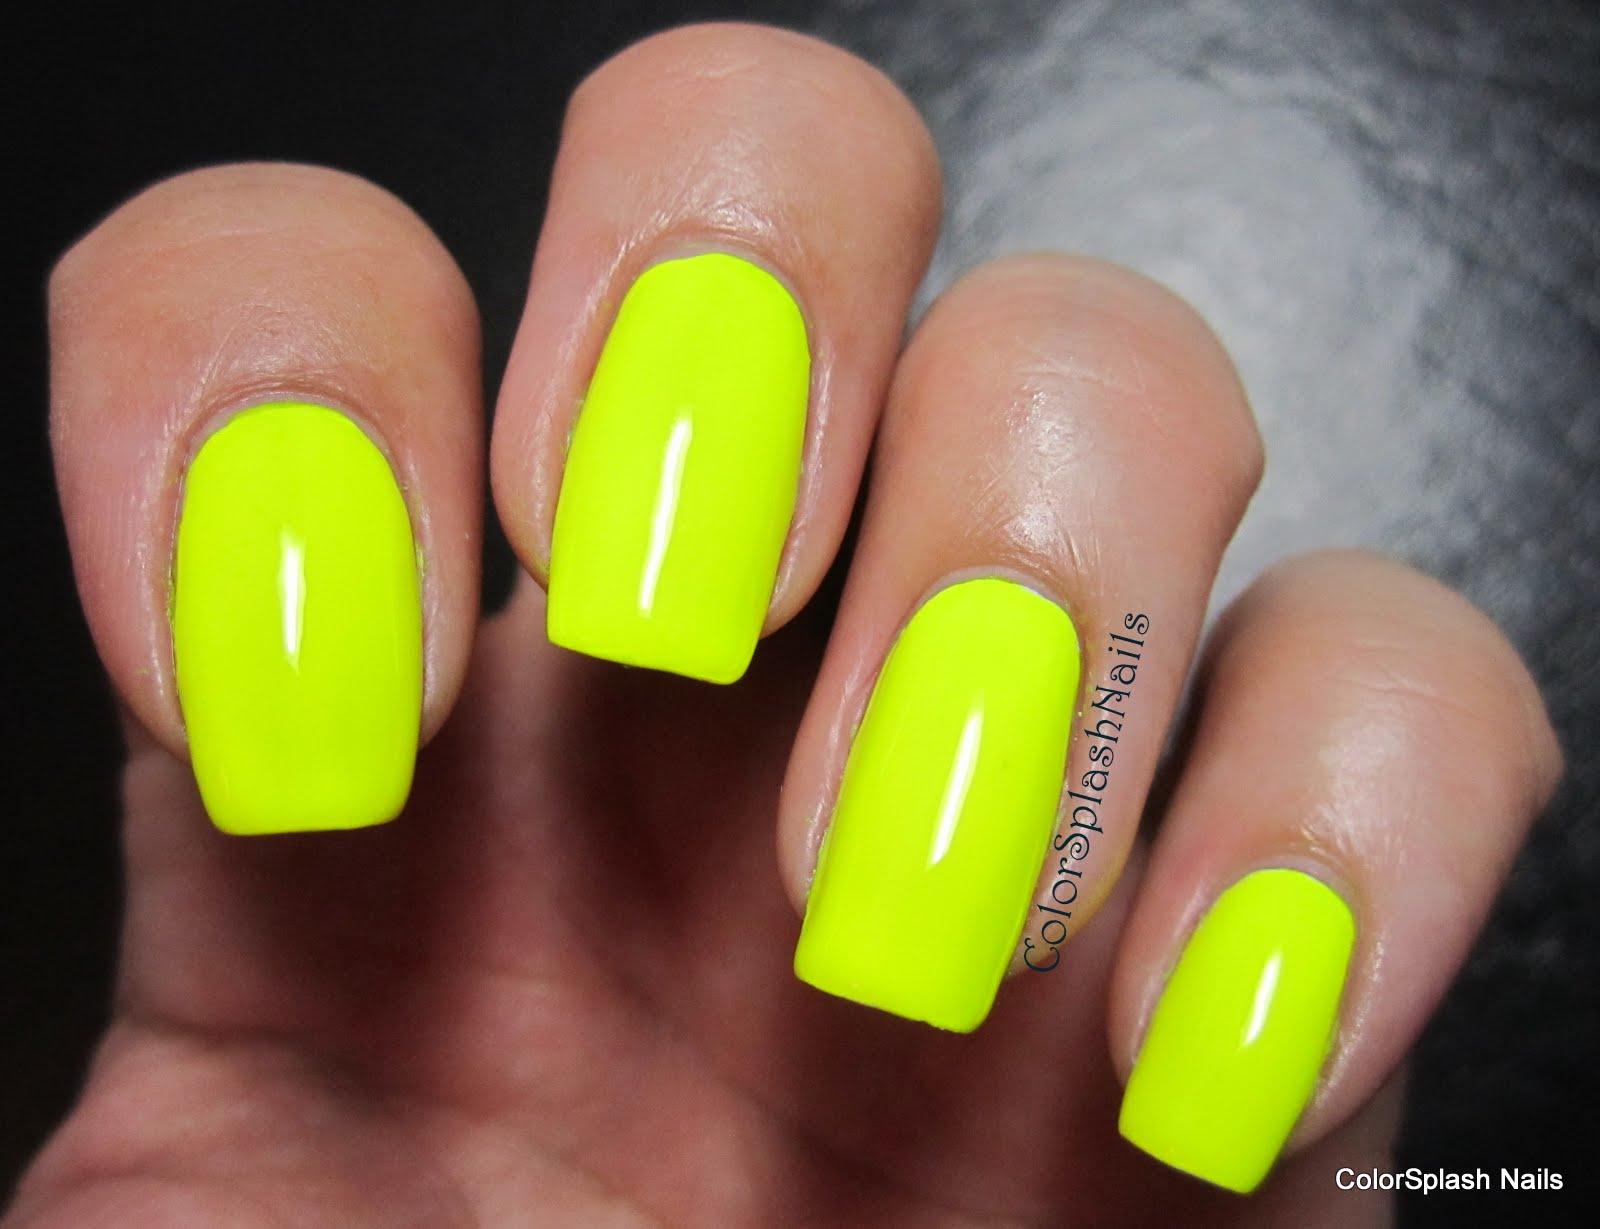 Colorsplash Nails: Gypsyanna Polish Catch Phrase Collection